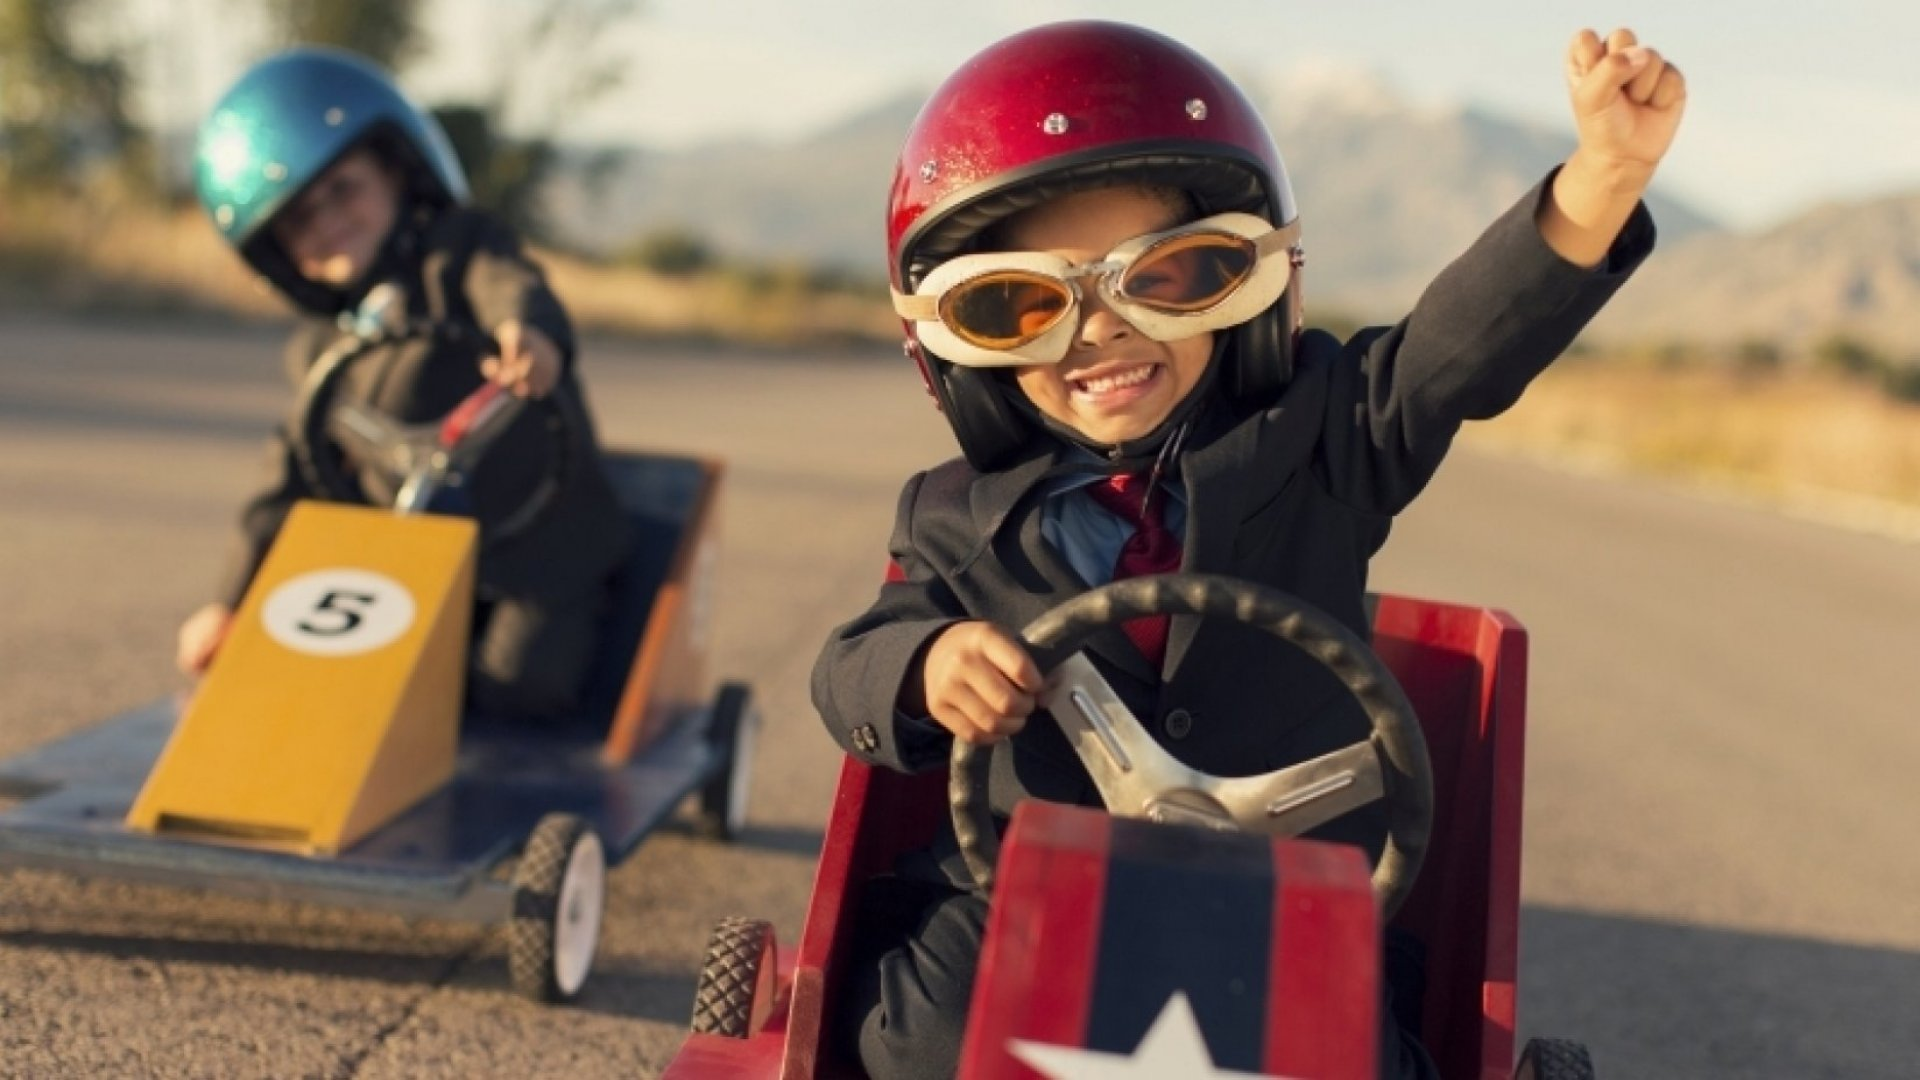 3 Leadership Skills You Must Master for Optimal Productivity, Impact and Joy